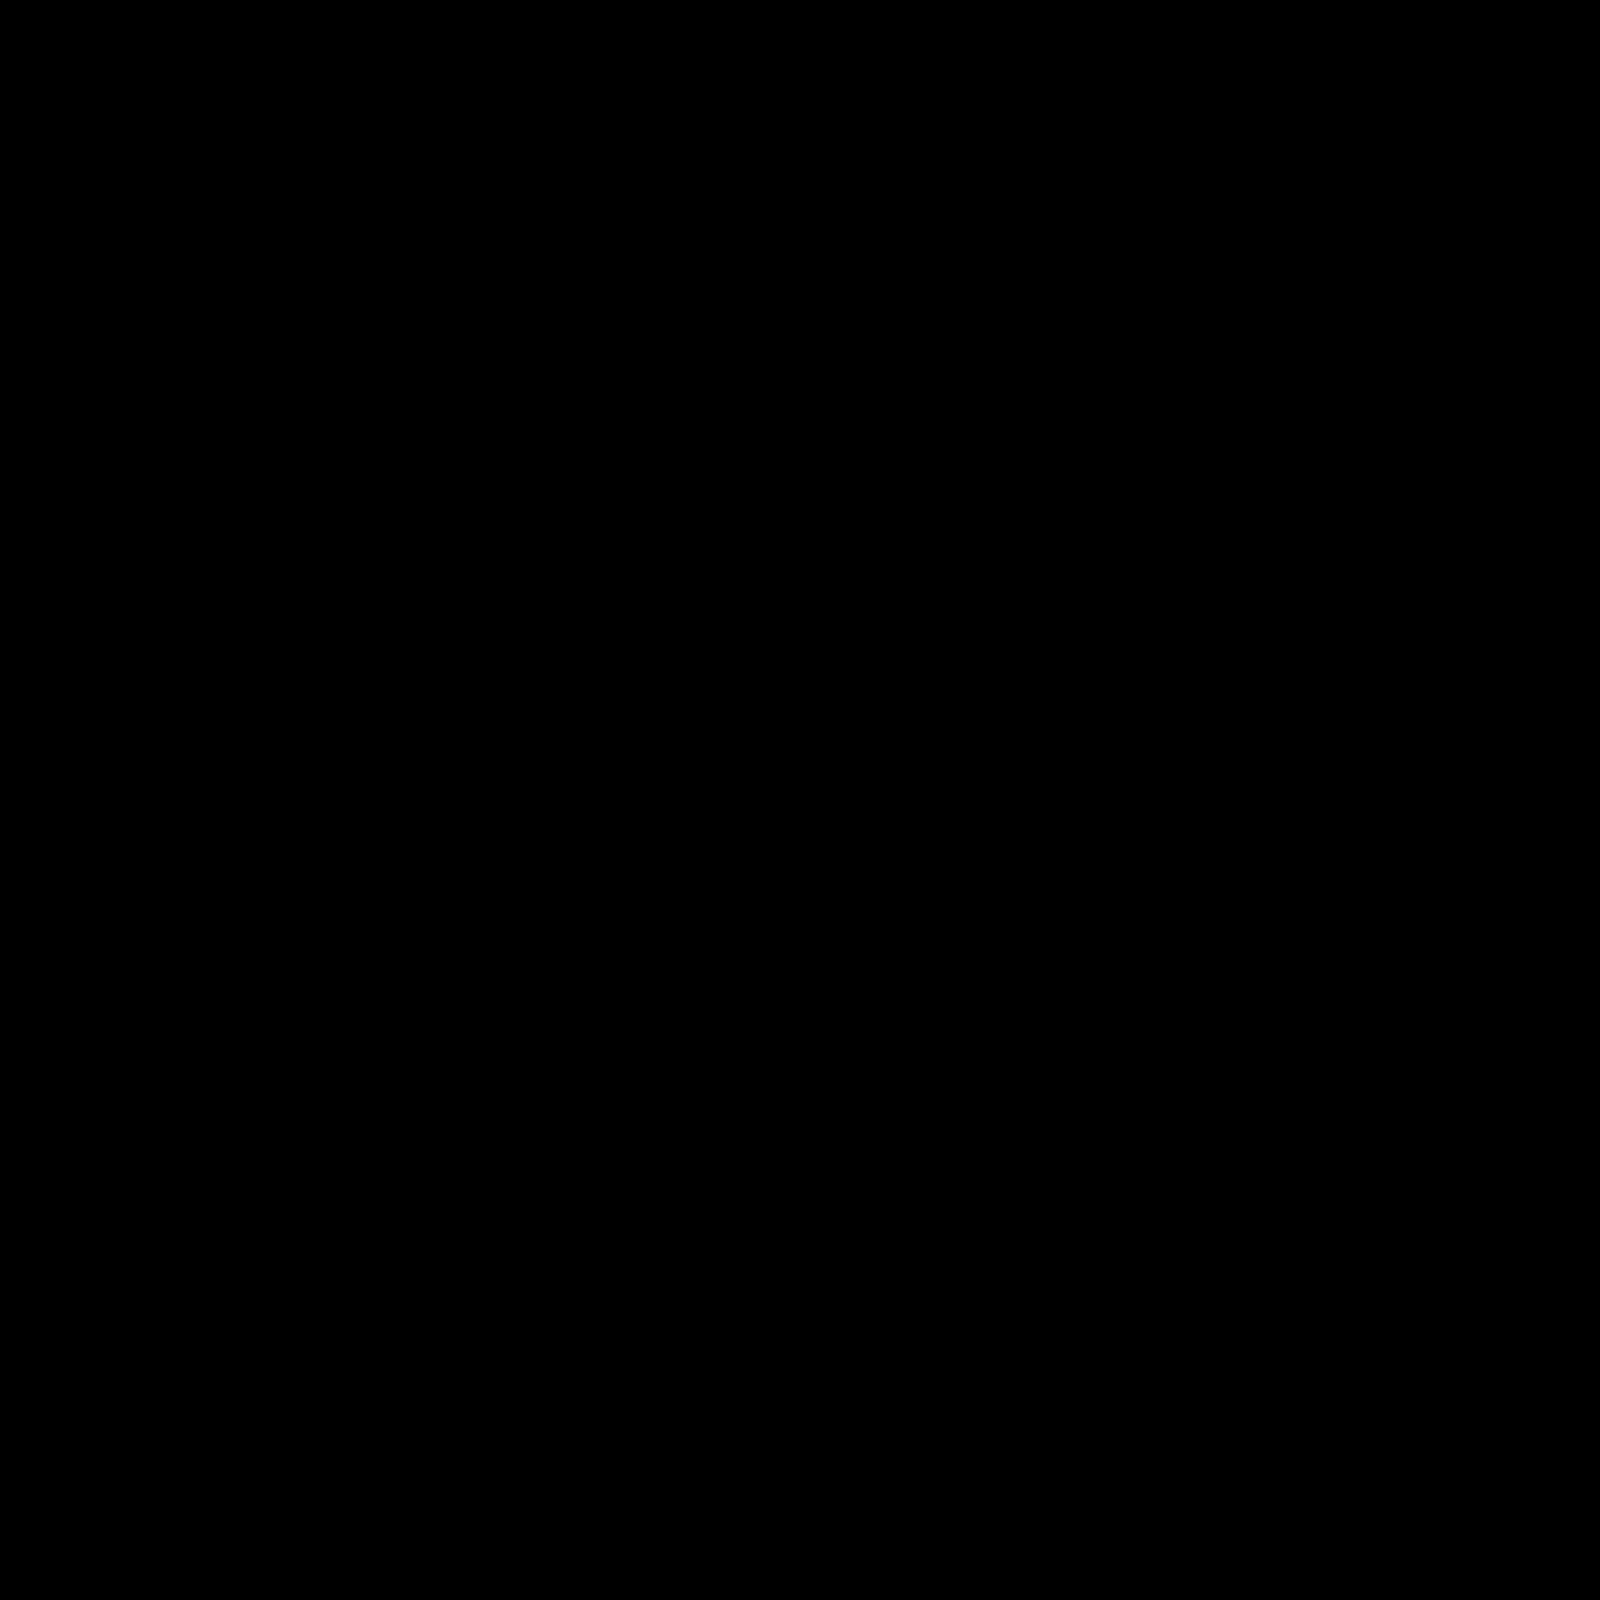 1600x1600 Airplane Icon